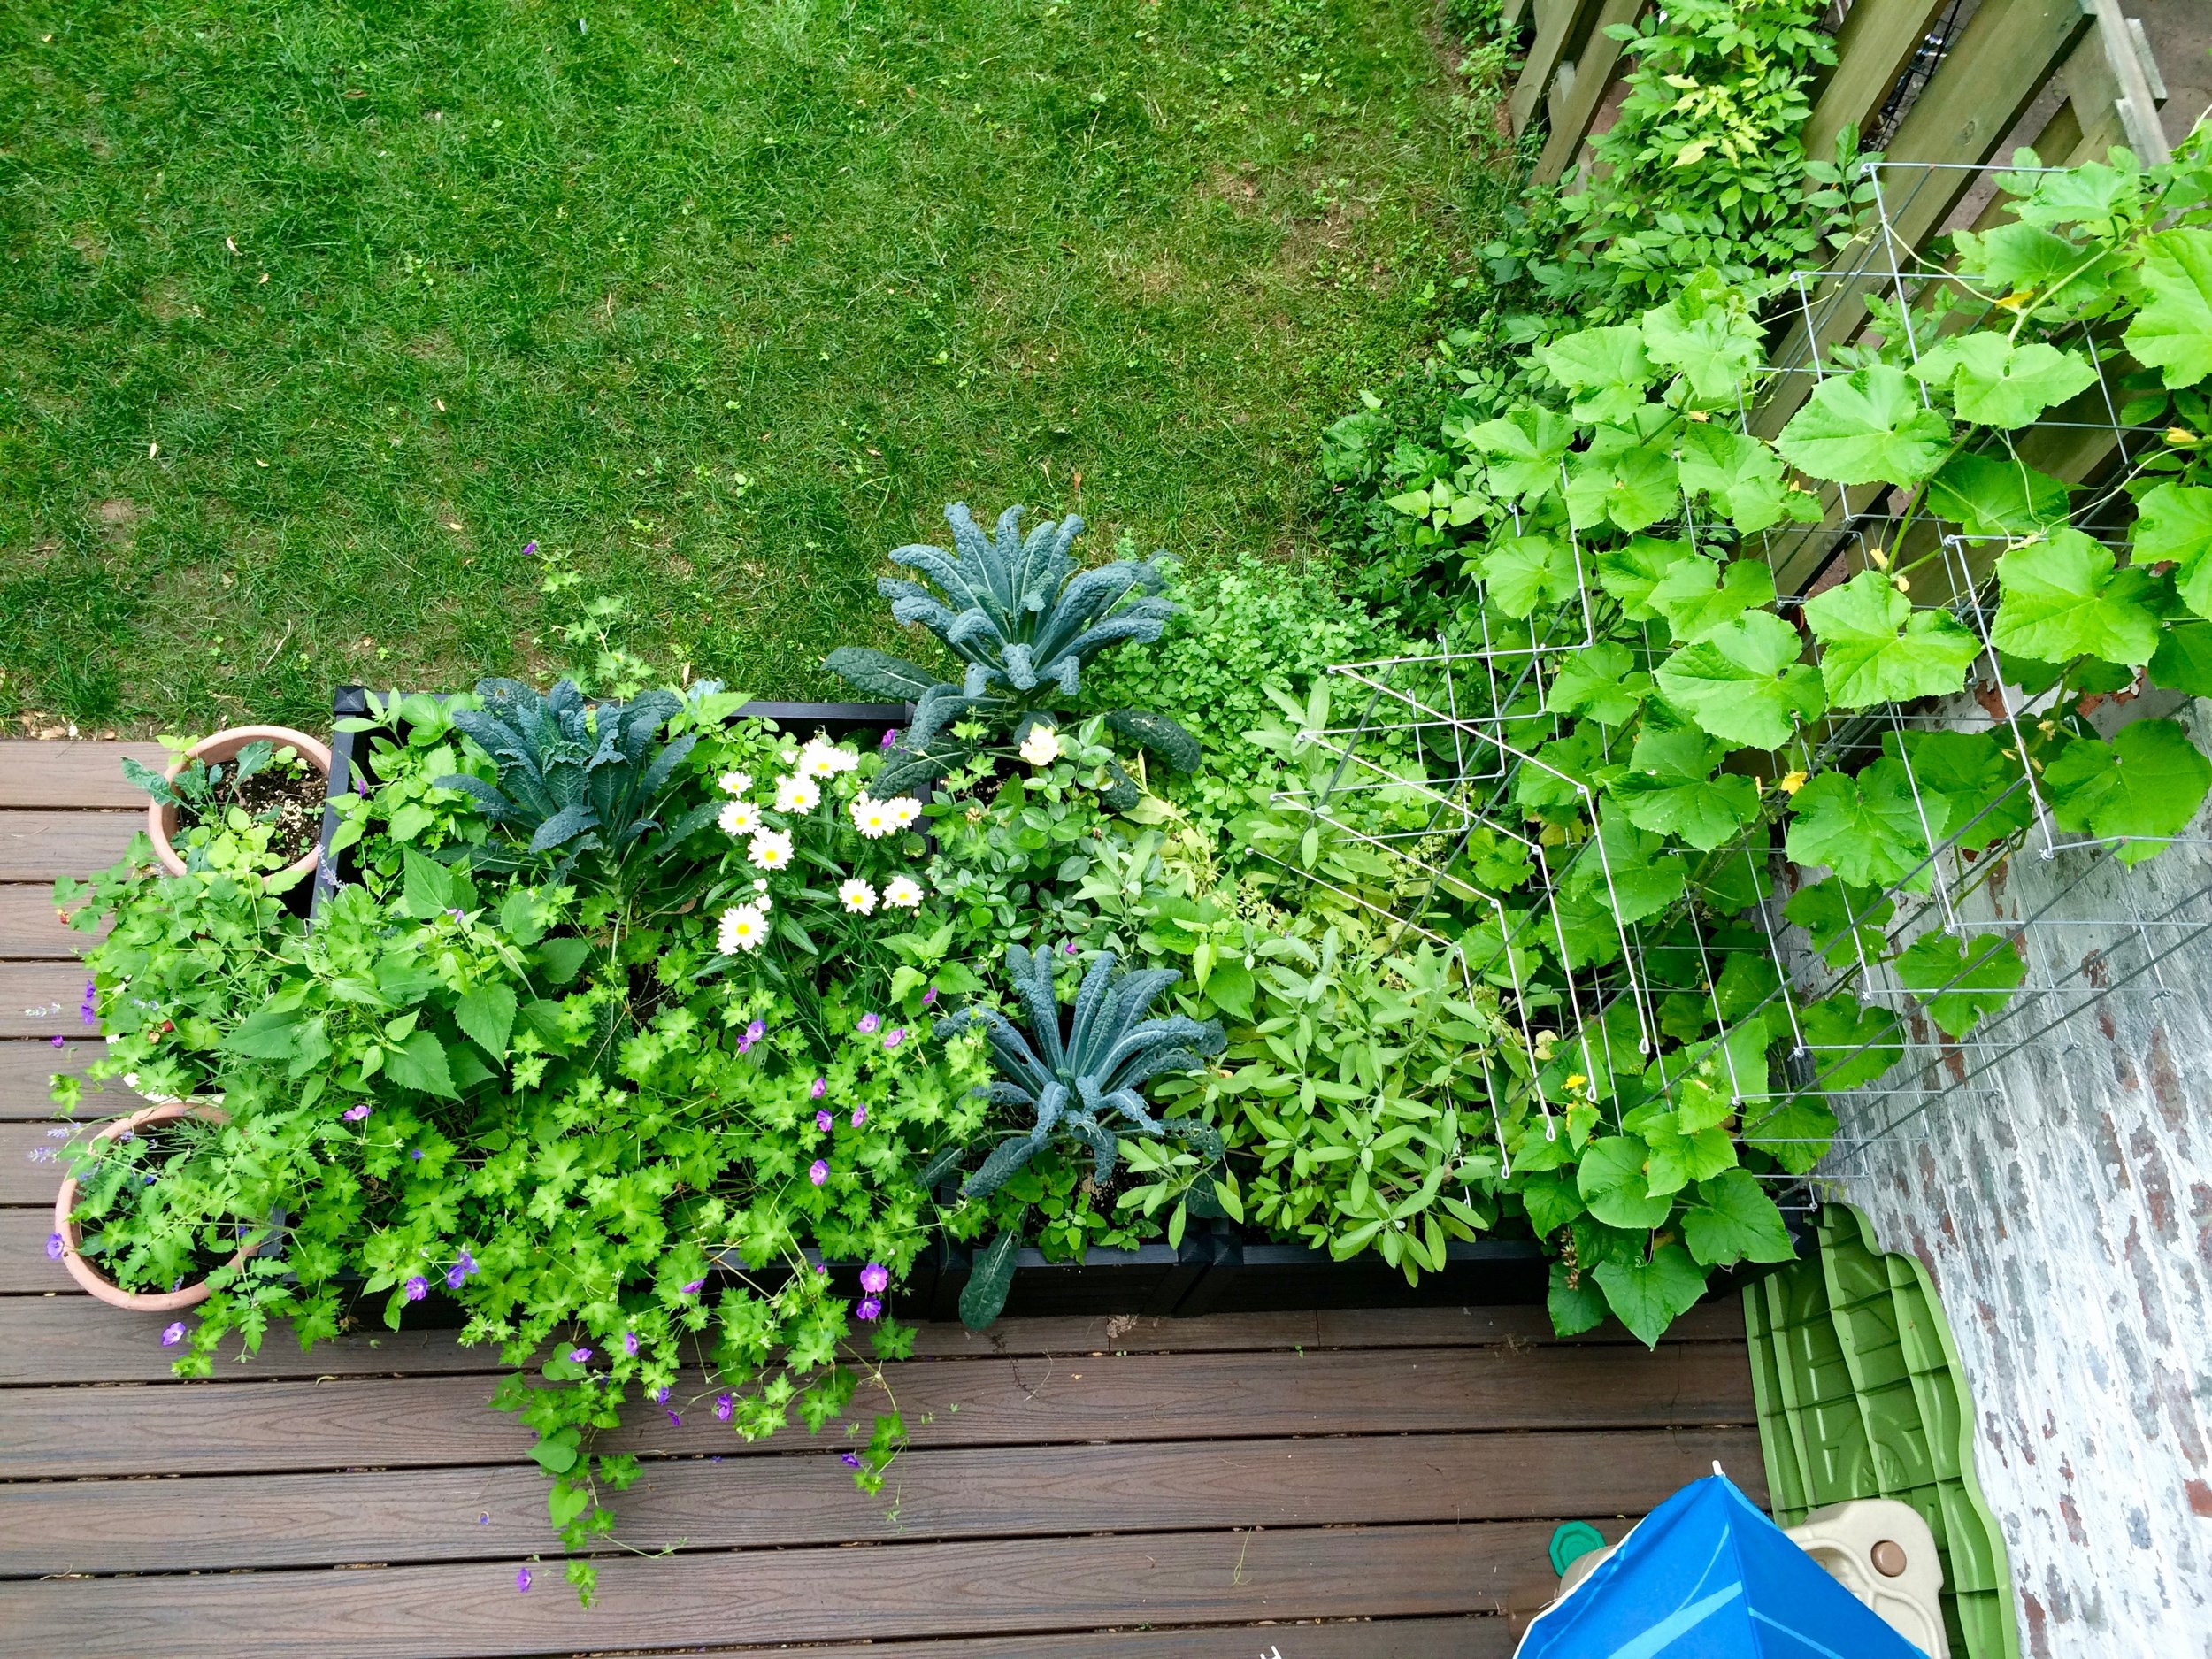 Square foot garden in my Brooklyn backyard, grown using Mel's Mix.